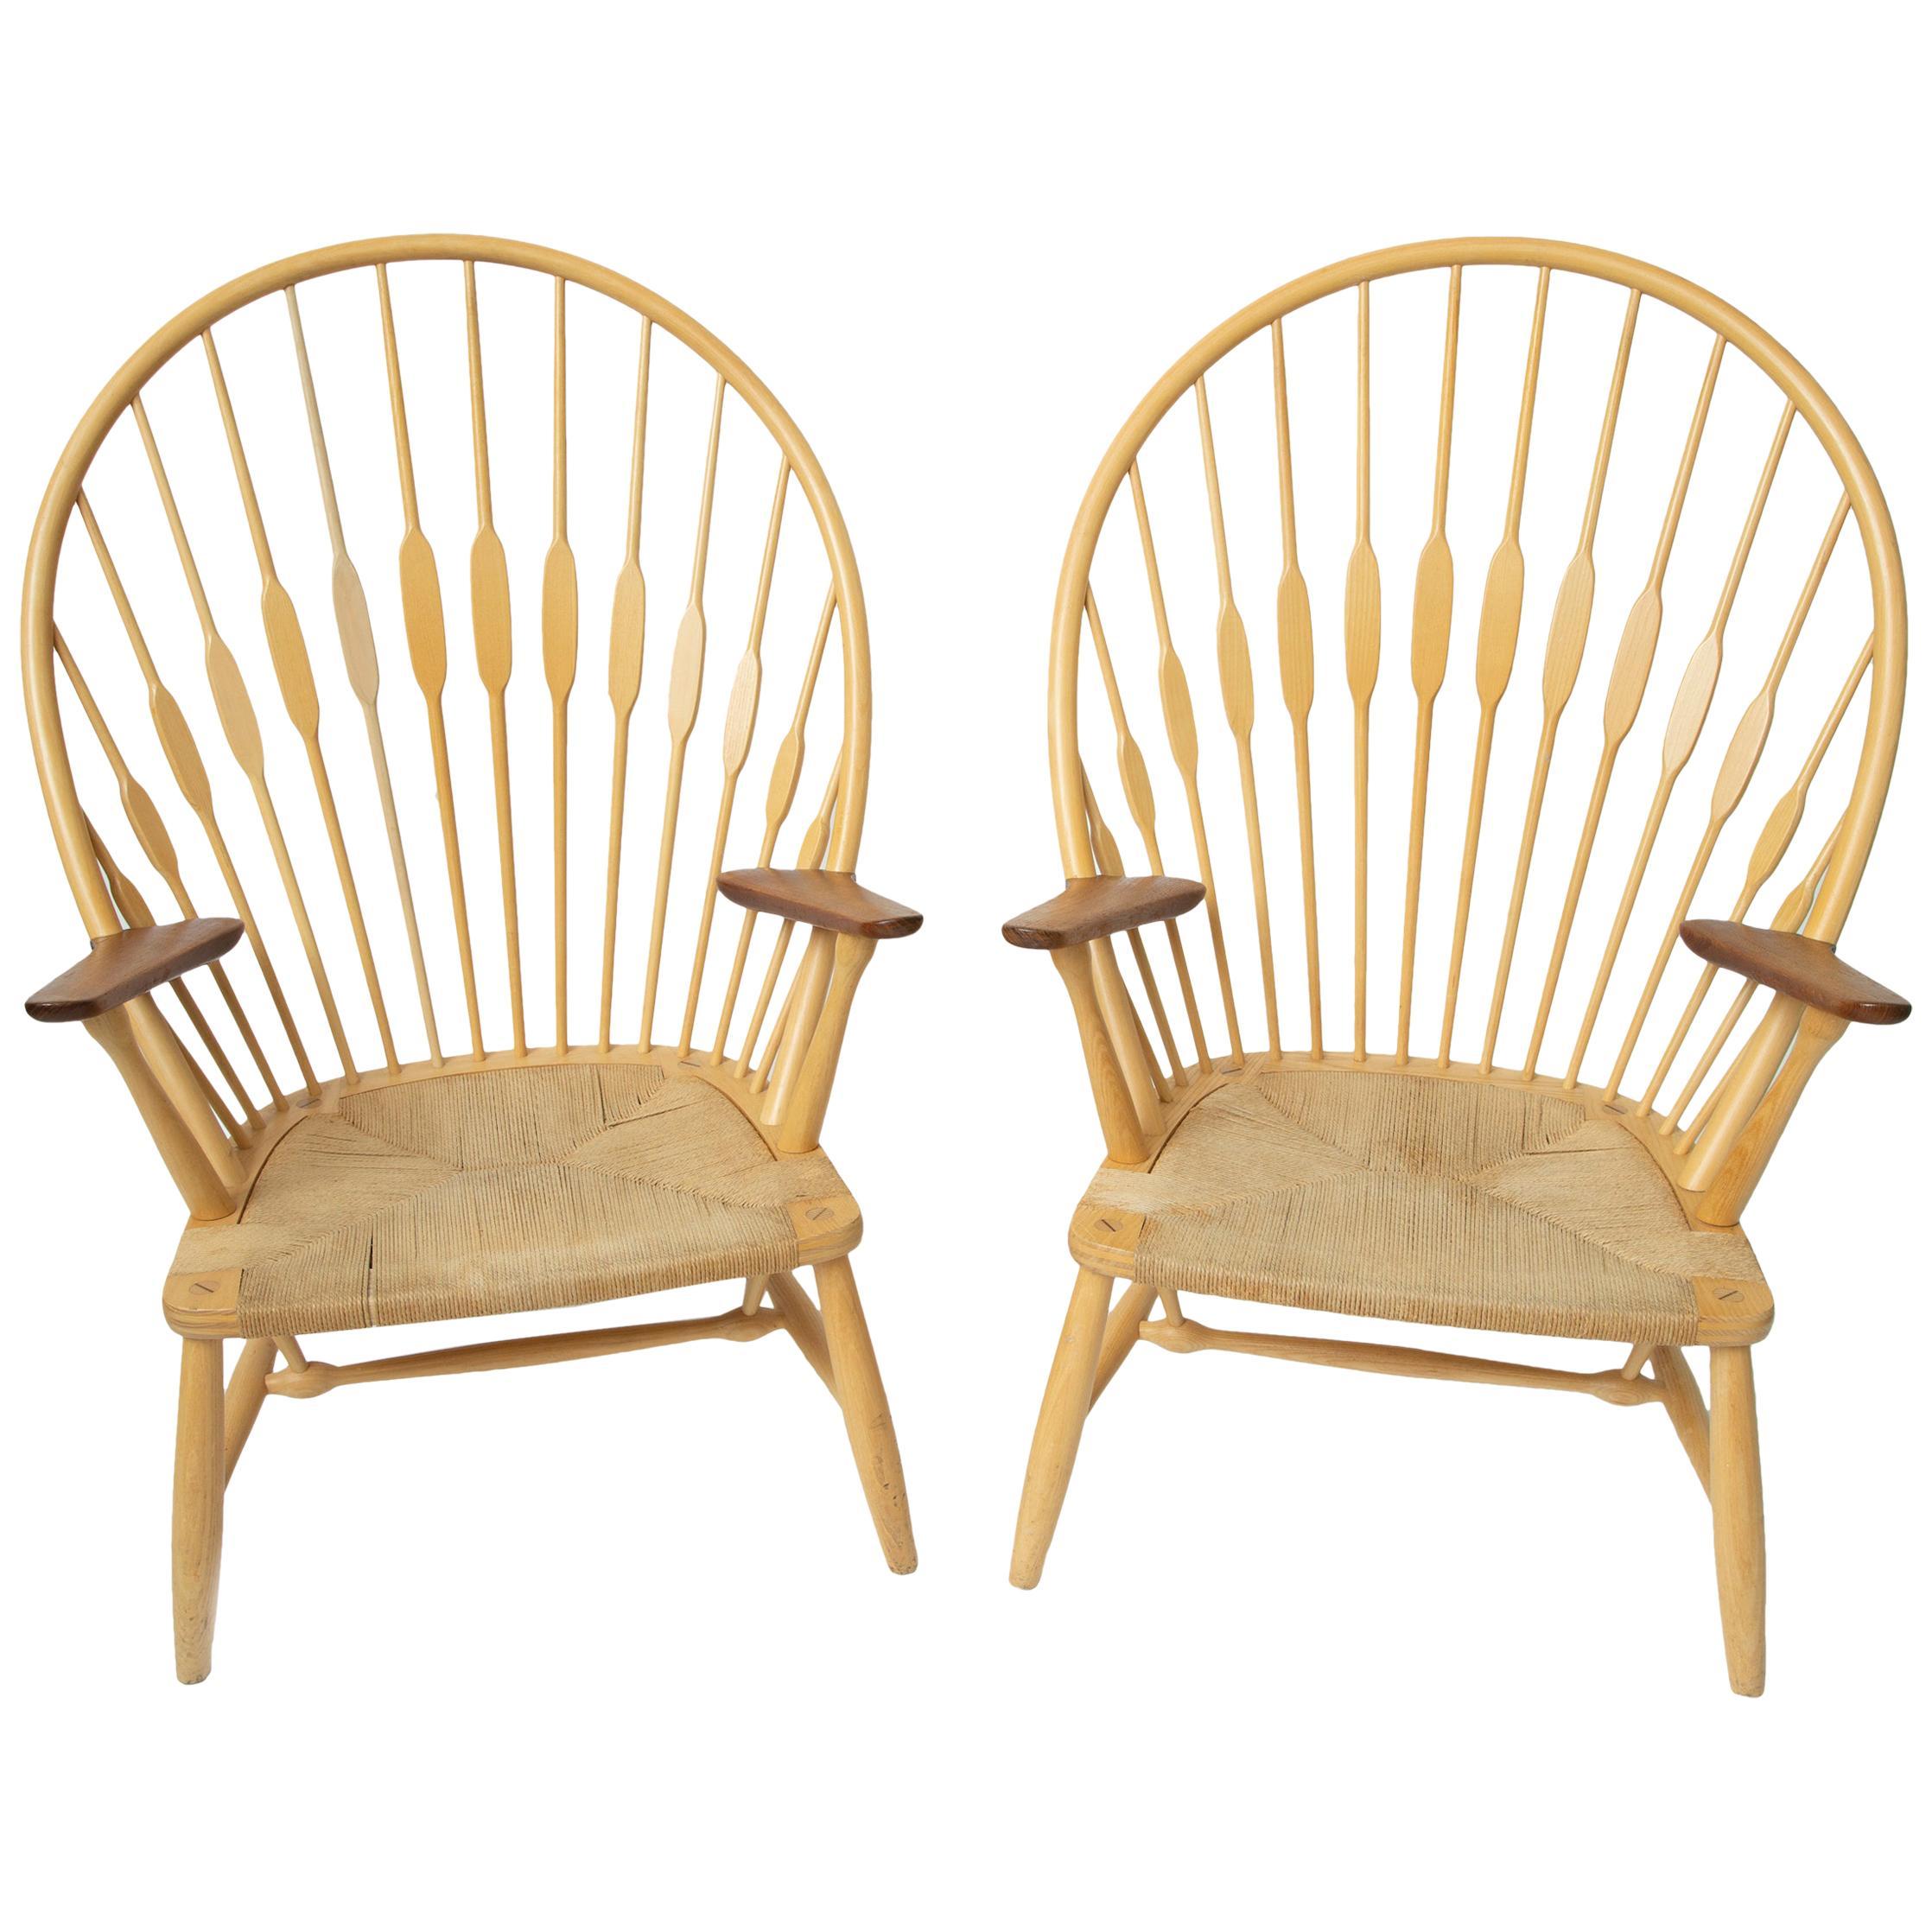 Hans Wegner Peacock Chairs